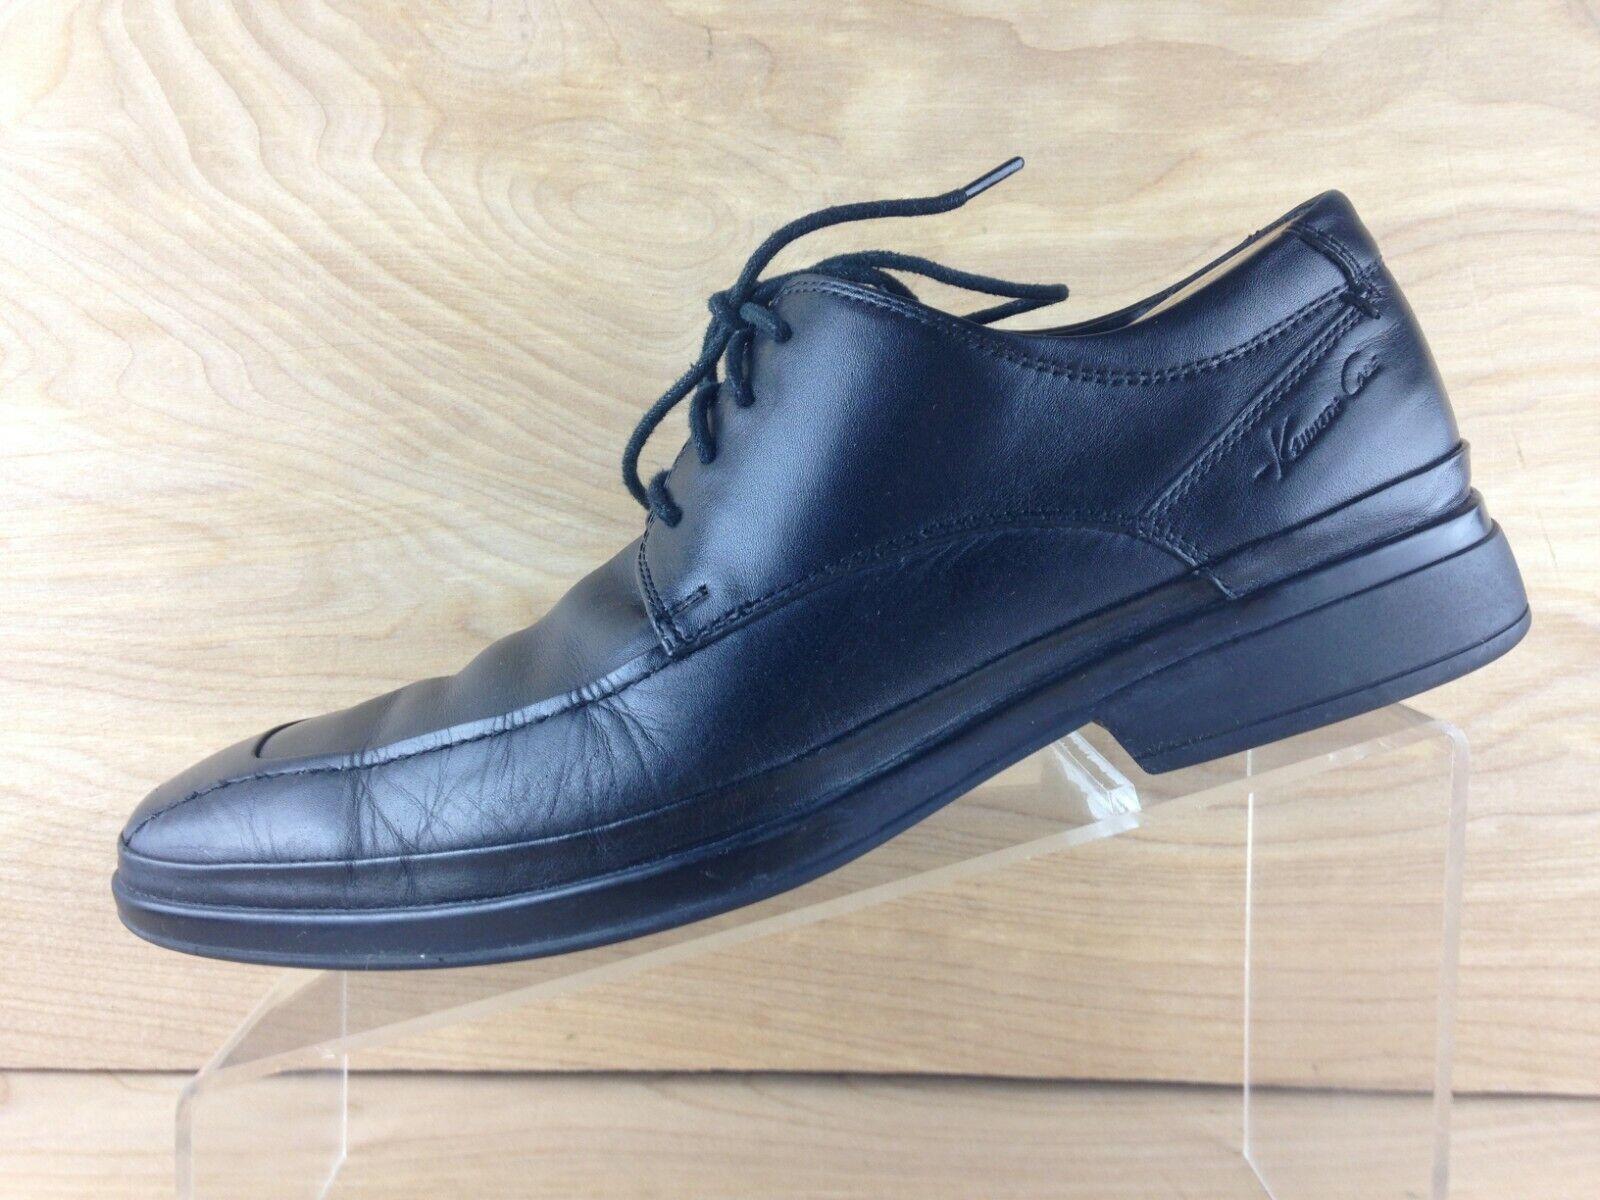 Kenneth Cole New York Walk the Walk Men Black Leather Apron Toe Oxford Size 8.5M